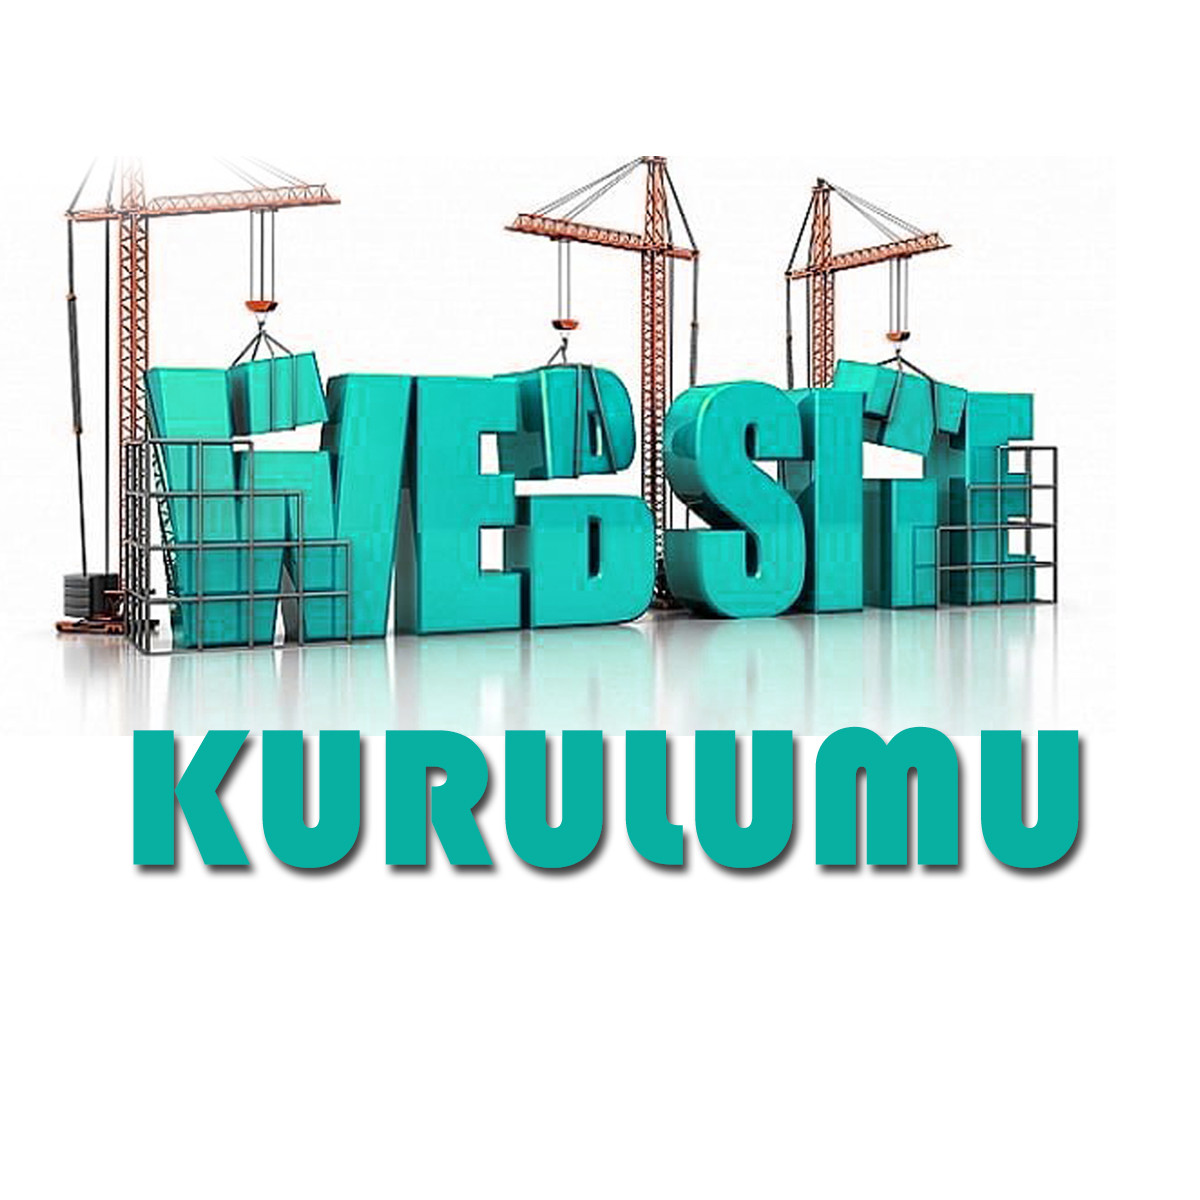 web site kurulumu